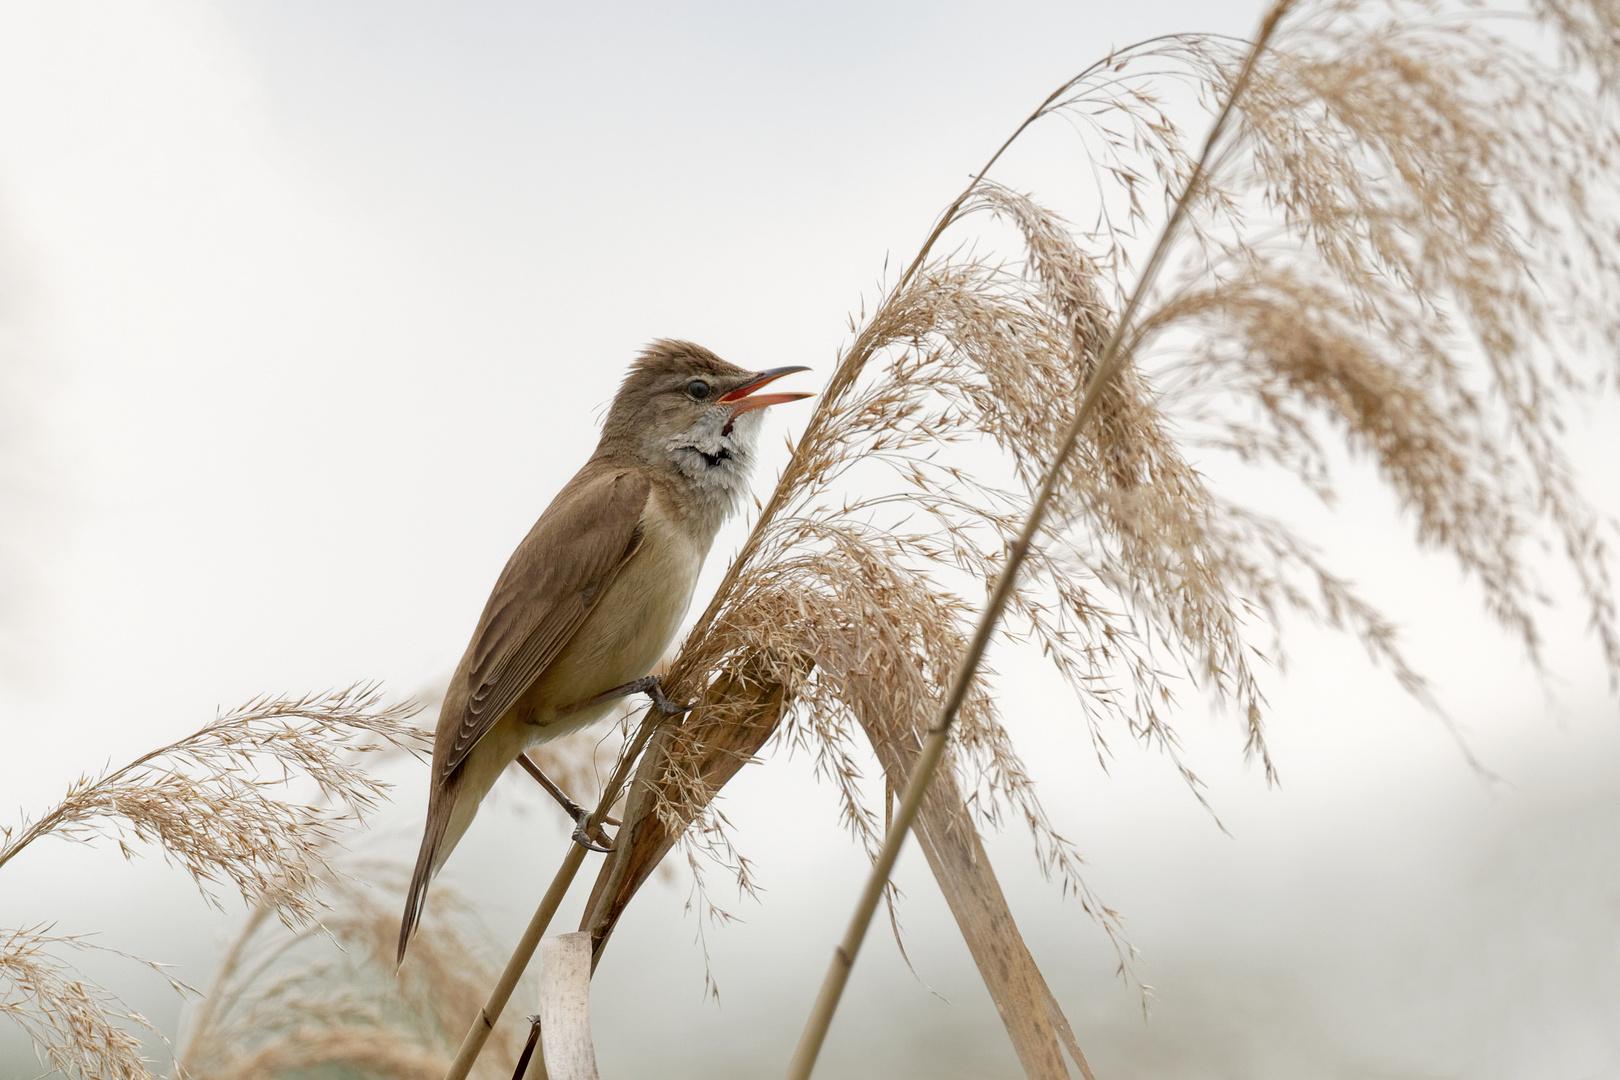 Drosselrohrsänger (Acrocephalus arundinaceus),  ein lauter Sänger